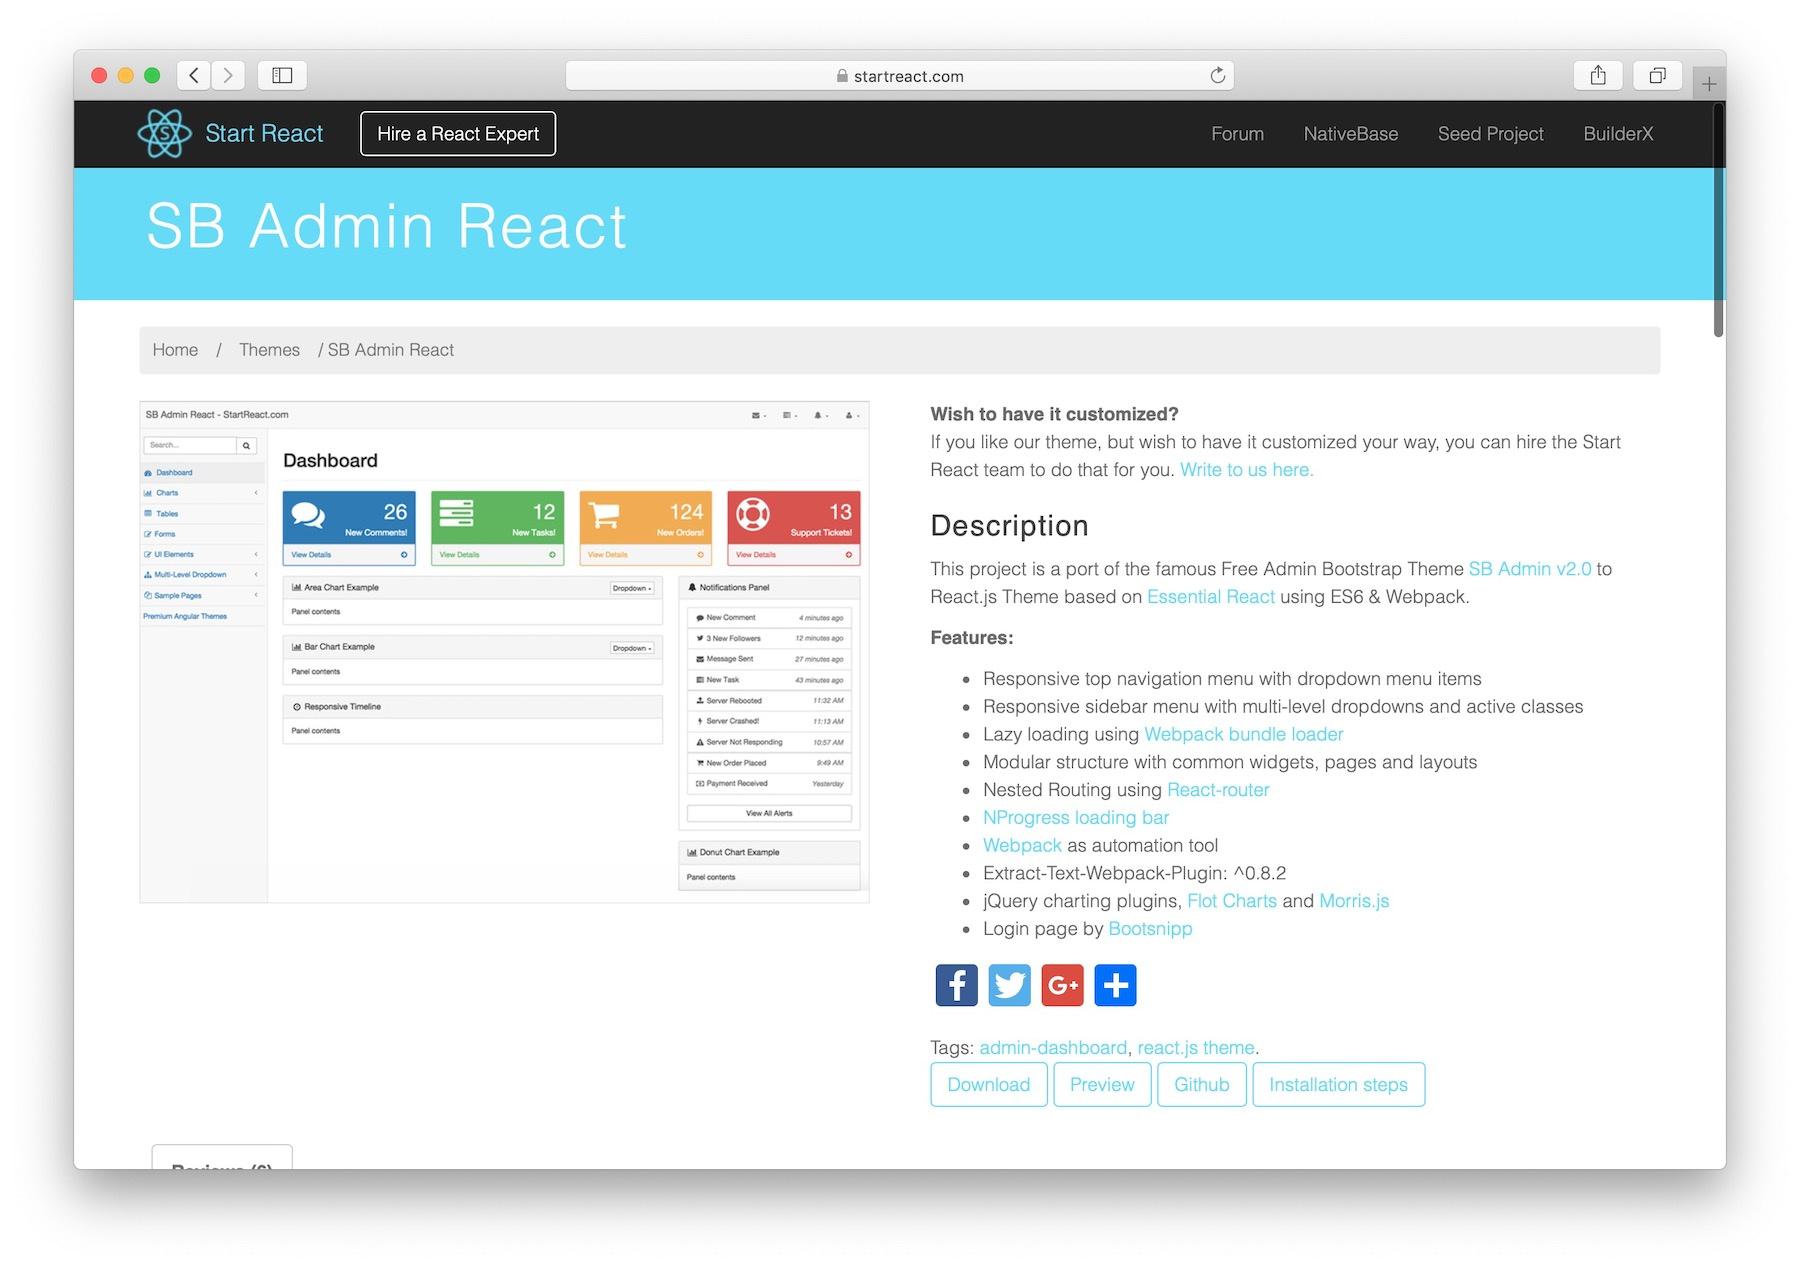 SB Admin React